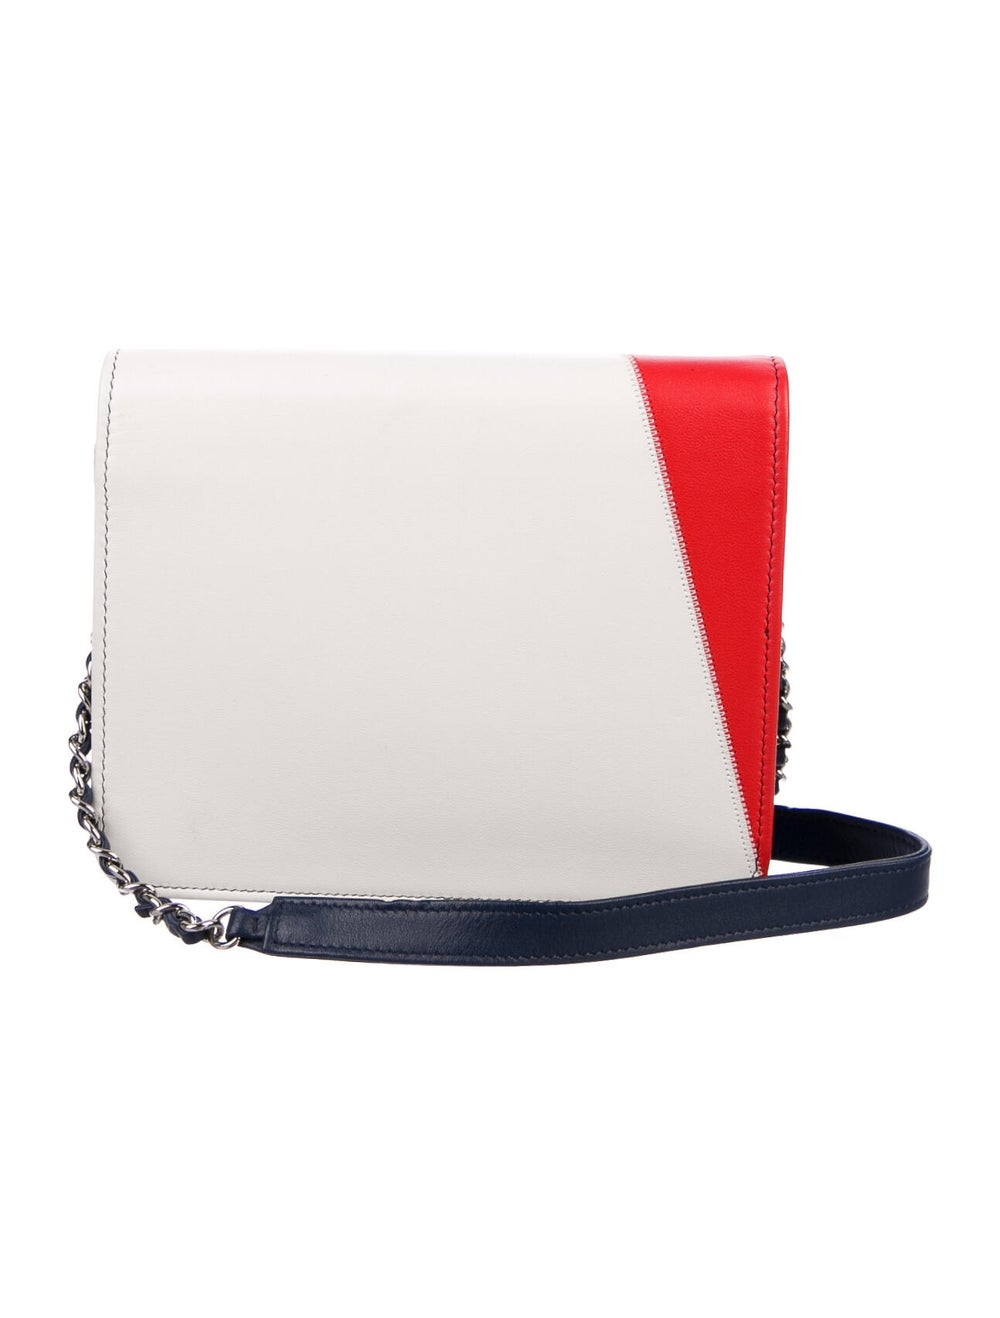 Chanel 2019 CC Accordion Flap Bag Blue - image 4